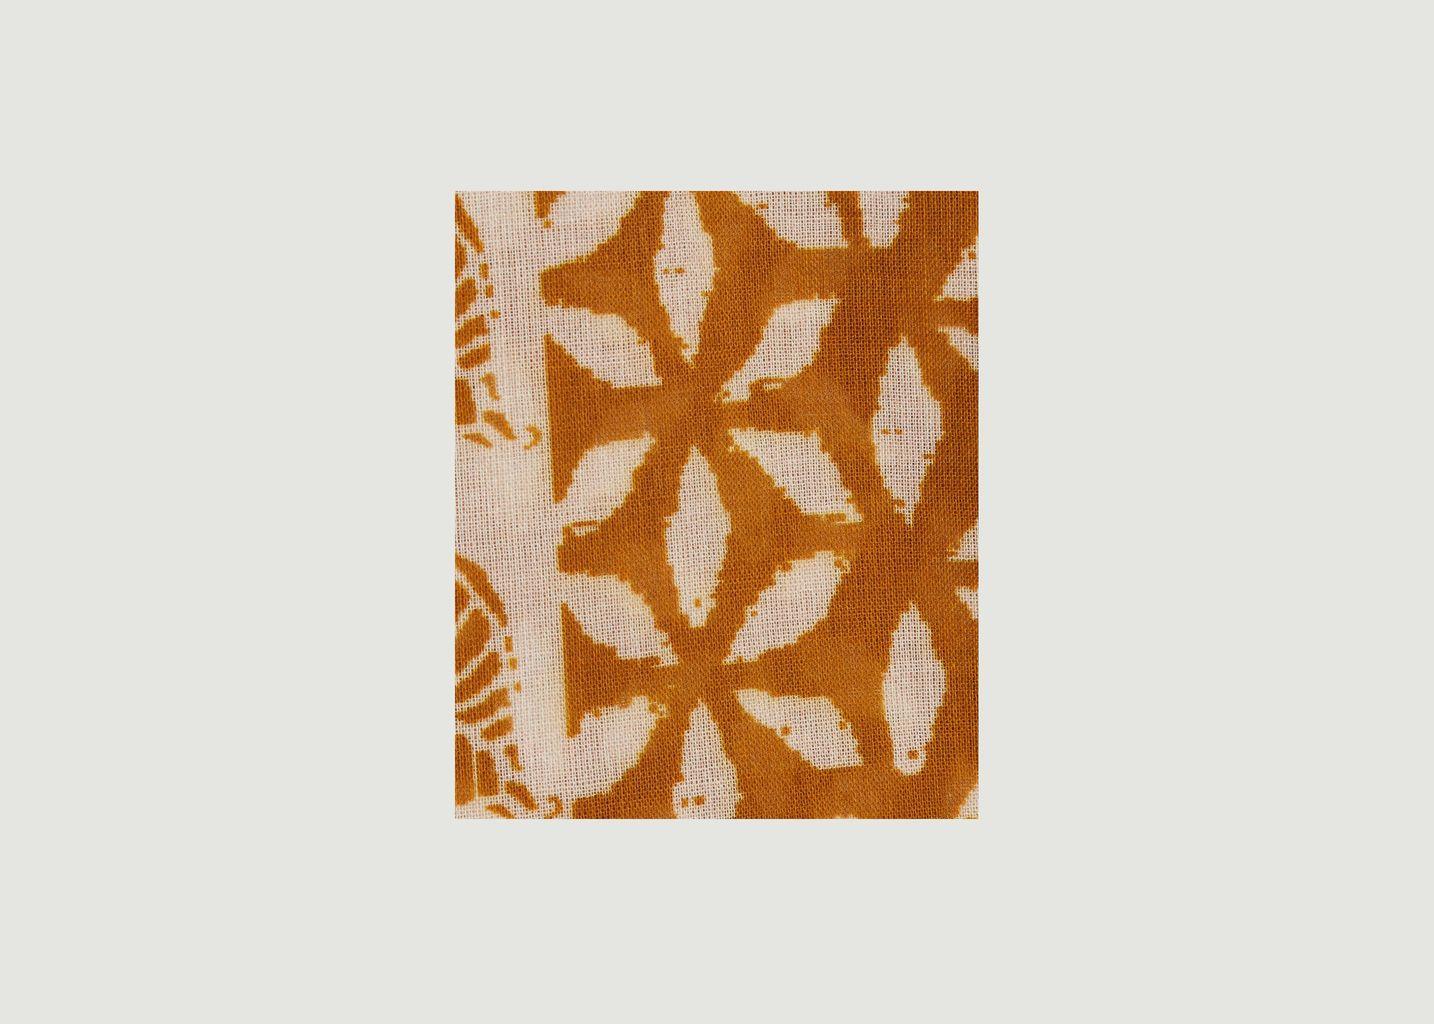 Echarpe en coton motif fantaisie - Hartford